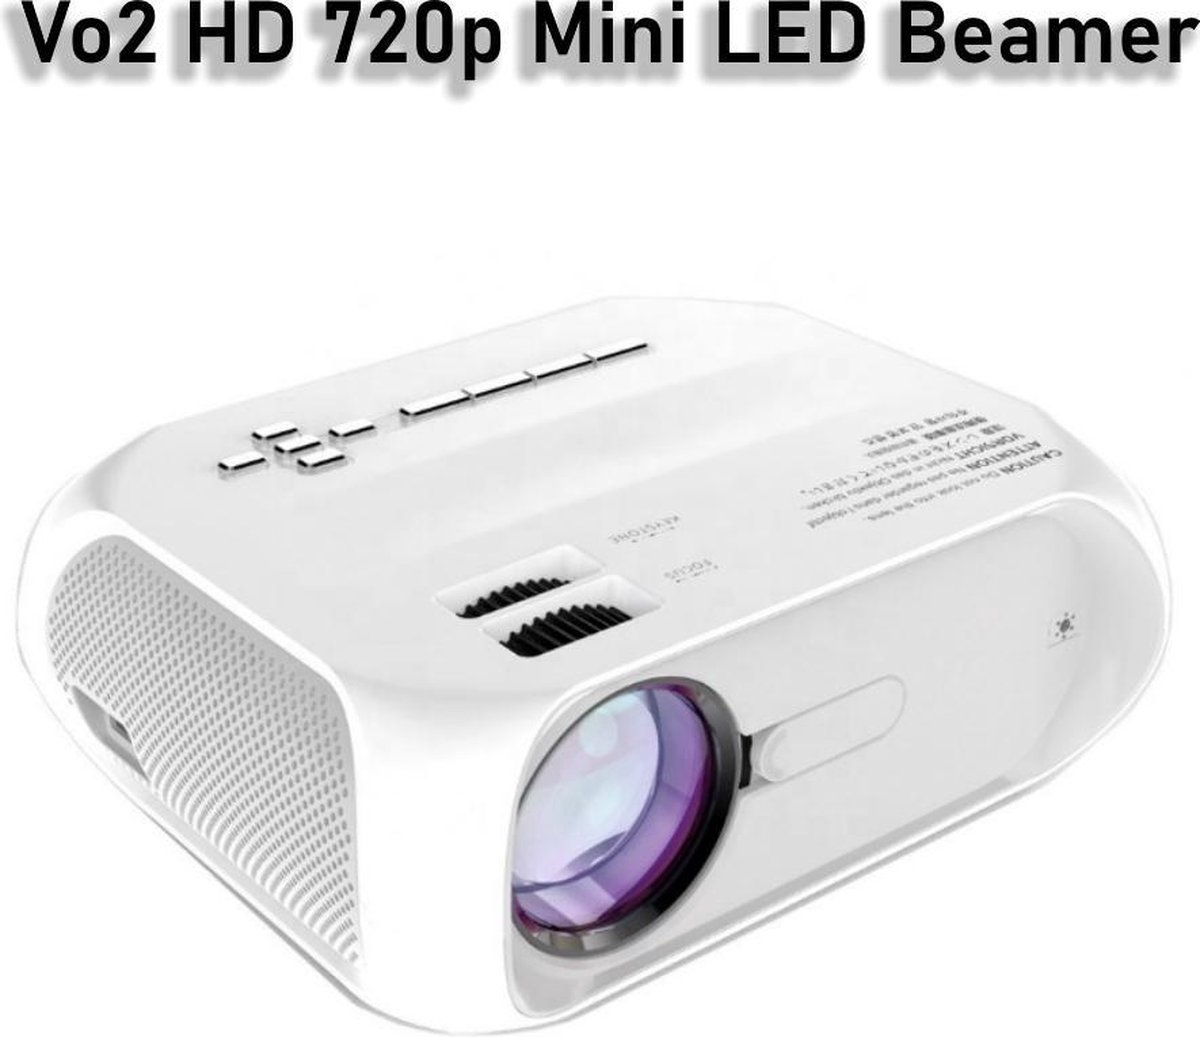 V02 HD 720p Mini LED LCD beamer - 4500 Lumens